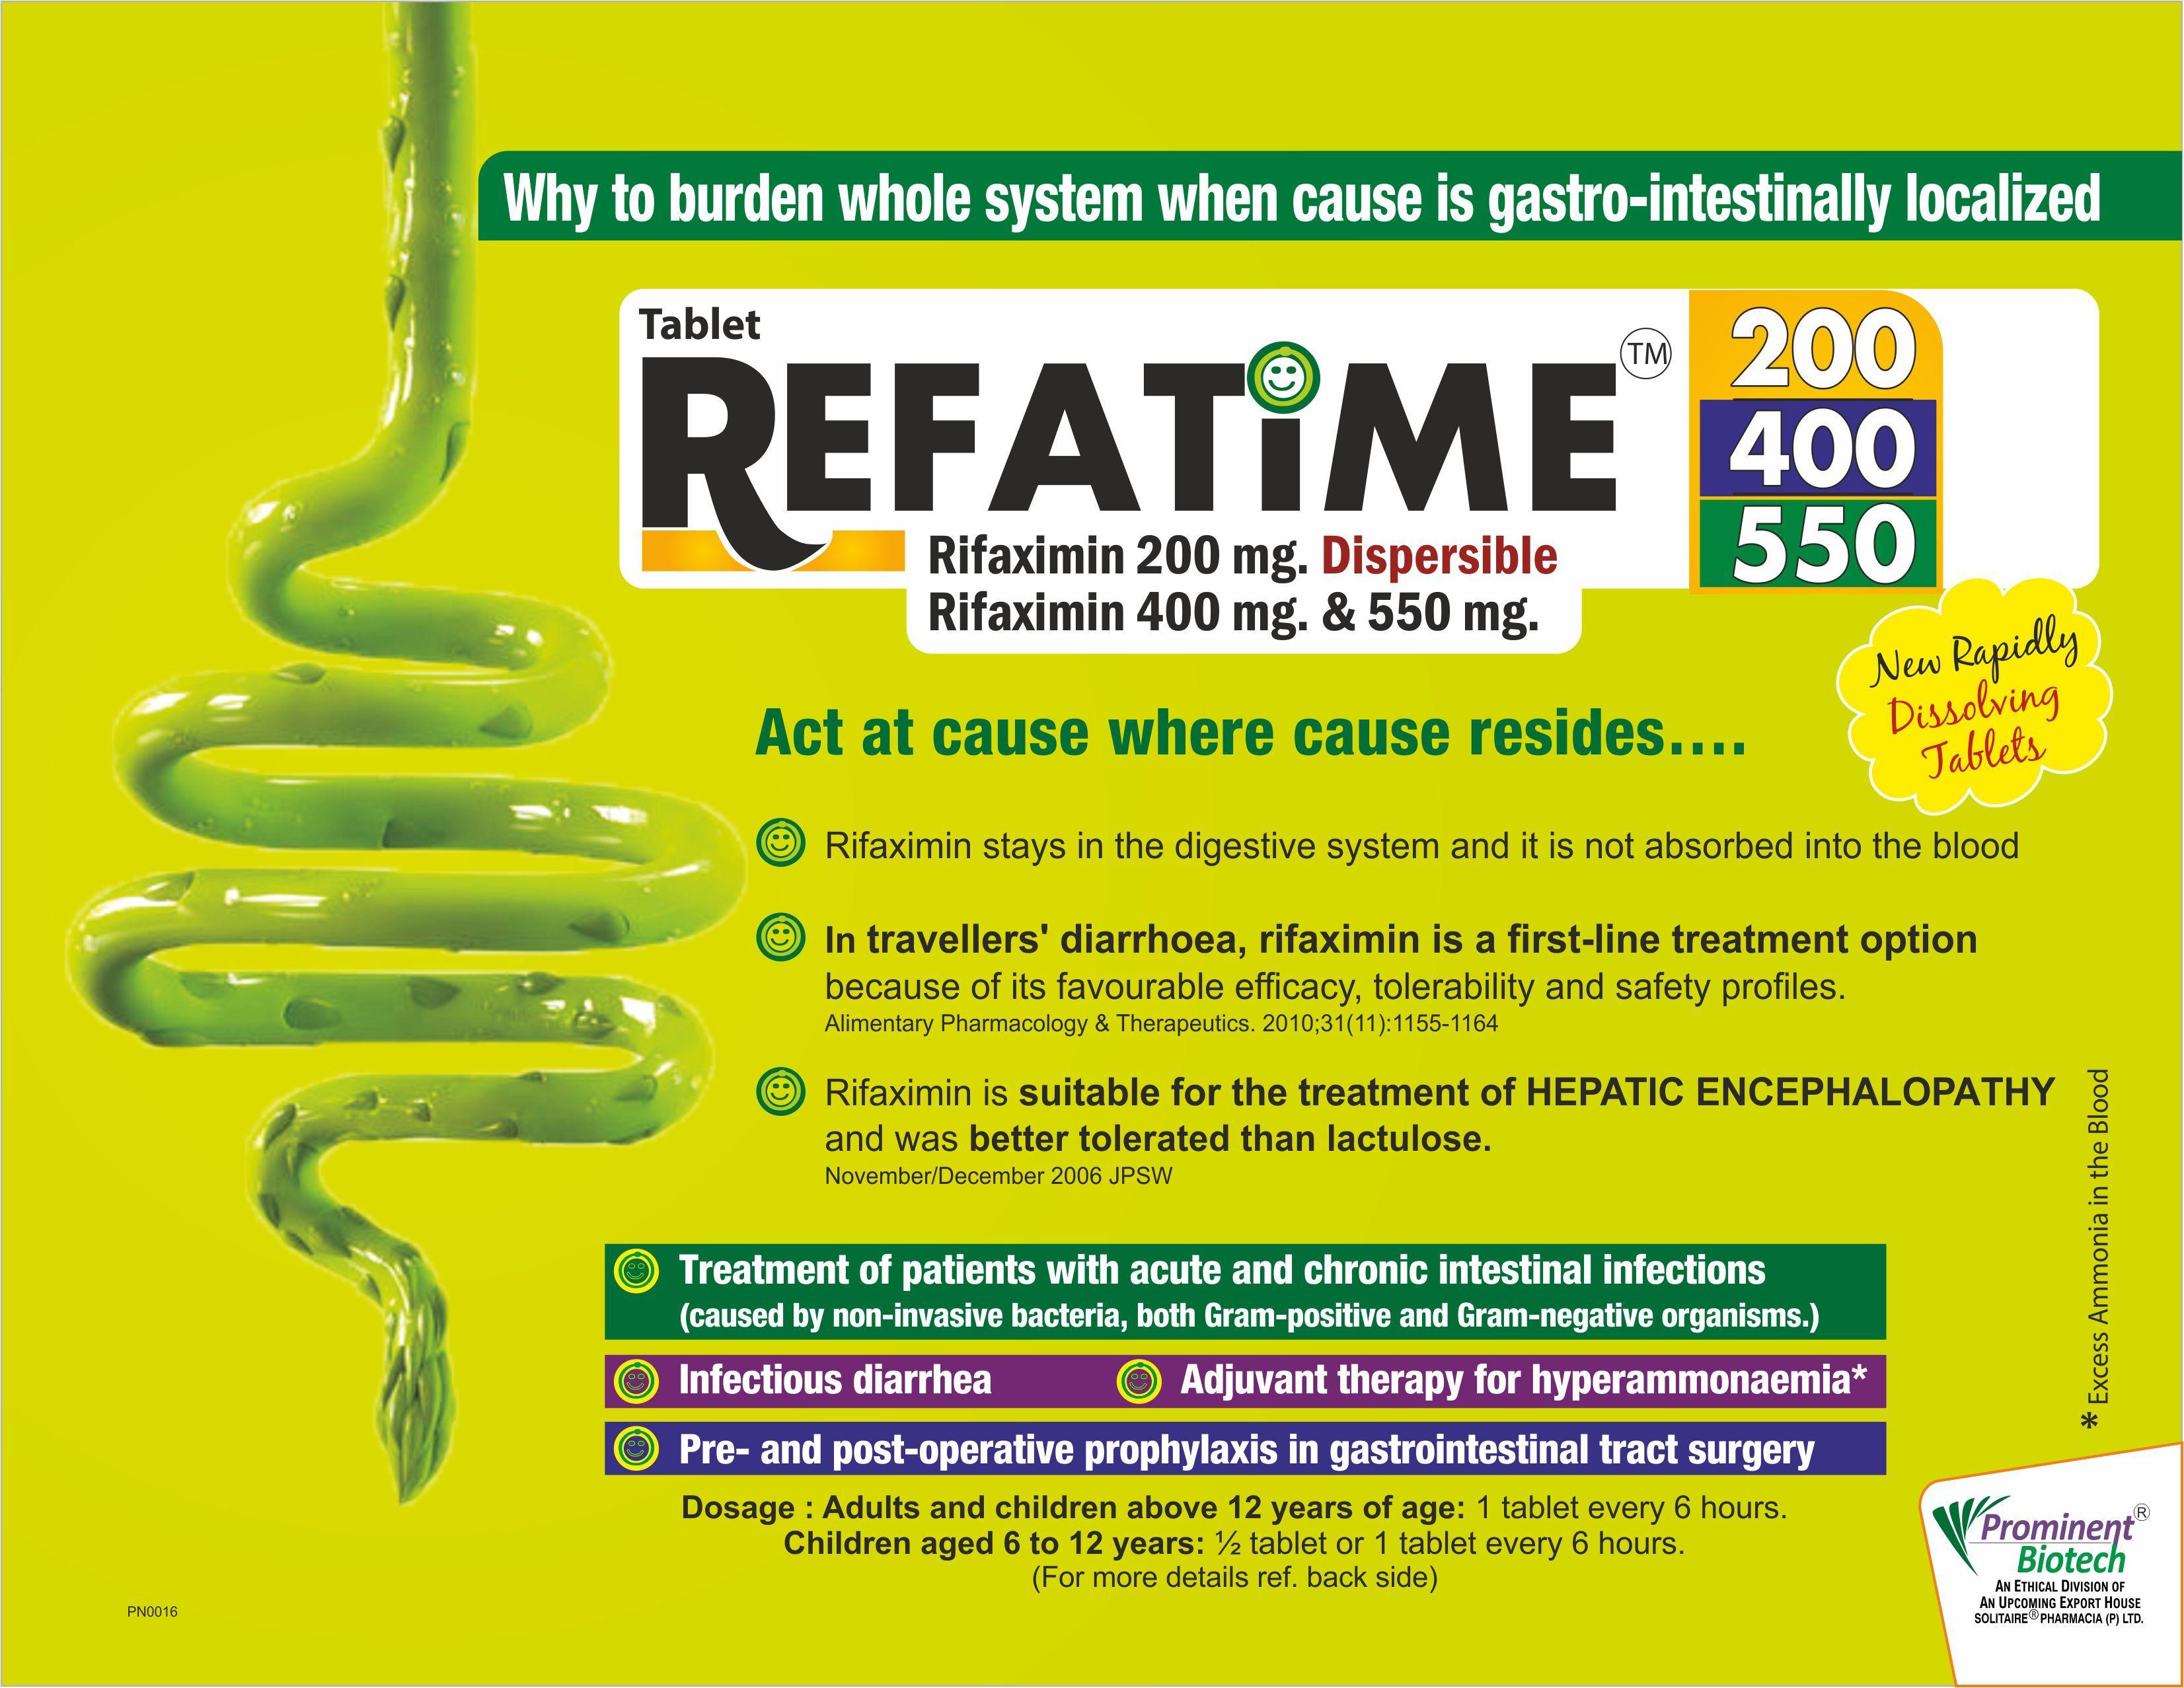 Rifaximin 200 mg,400 mg,550 mg